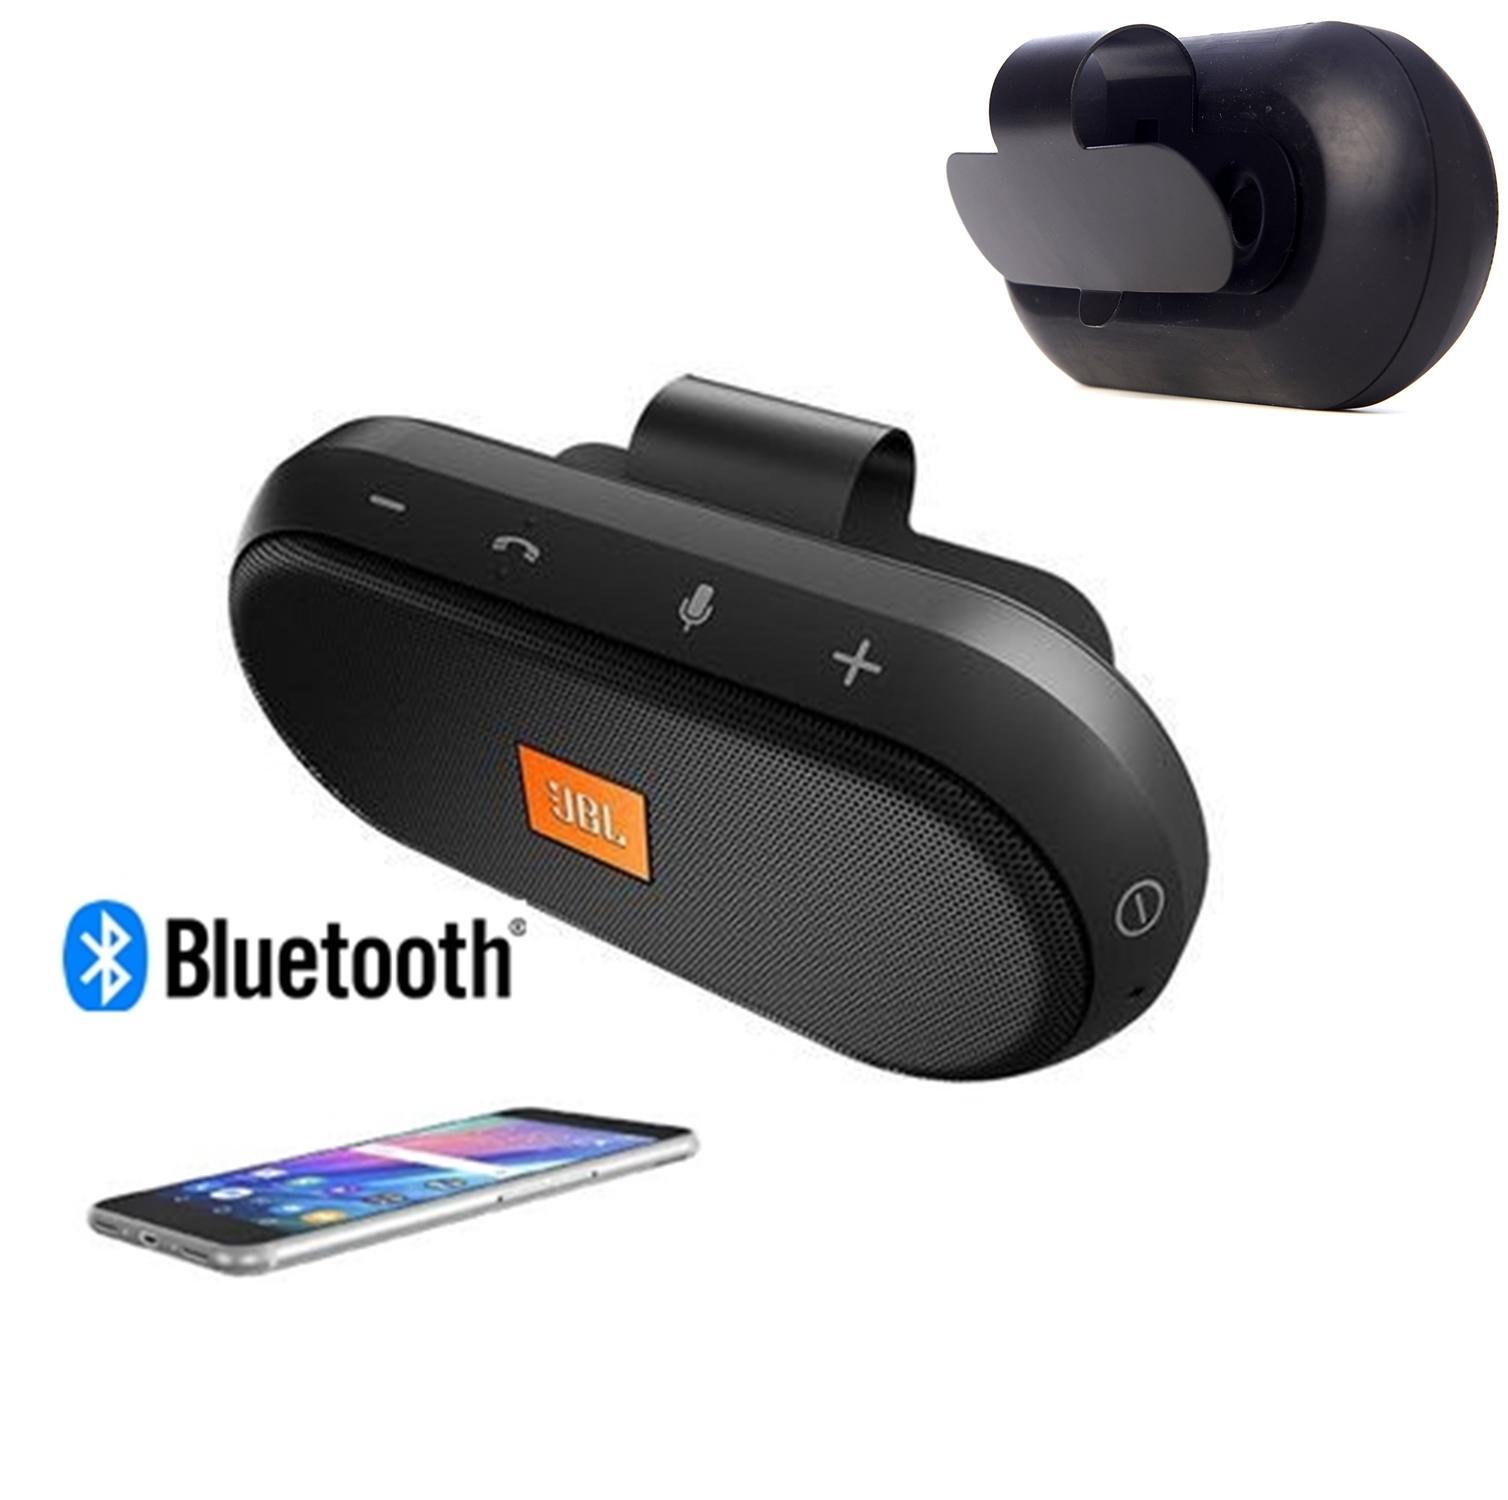 Portable Speakers Universal Er Music Lampu Bluetooth Warna Warni Mitsuyama Ms 0707 Jbl Trip Visor Mount Speaker By Harman